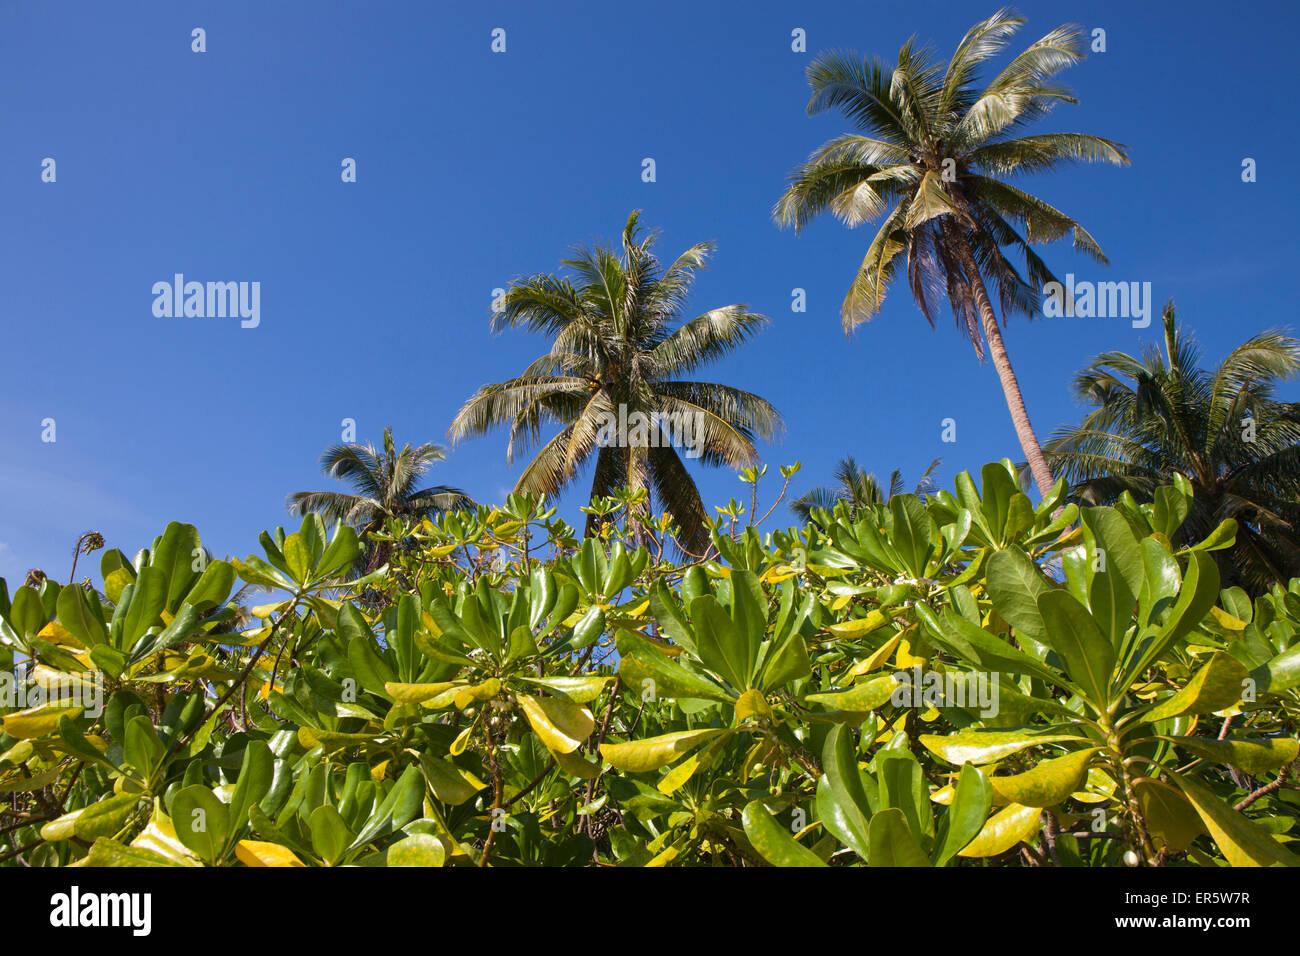 Palm trees on the beach, Bang Saphan, Prachuap Khiri Khan Province, Thailand, Asia - Stock Image